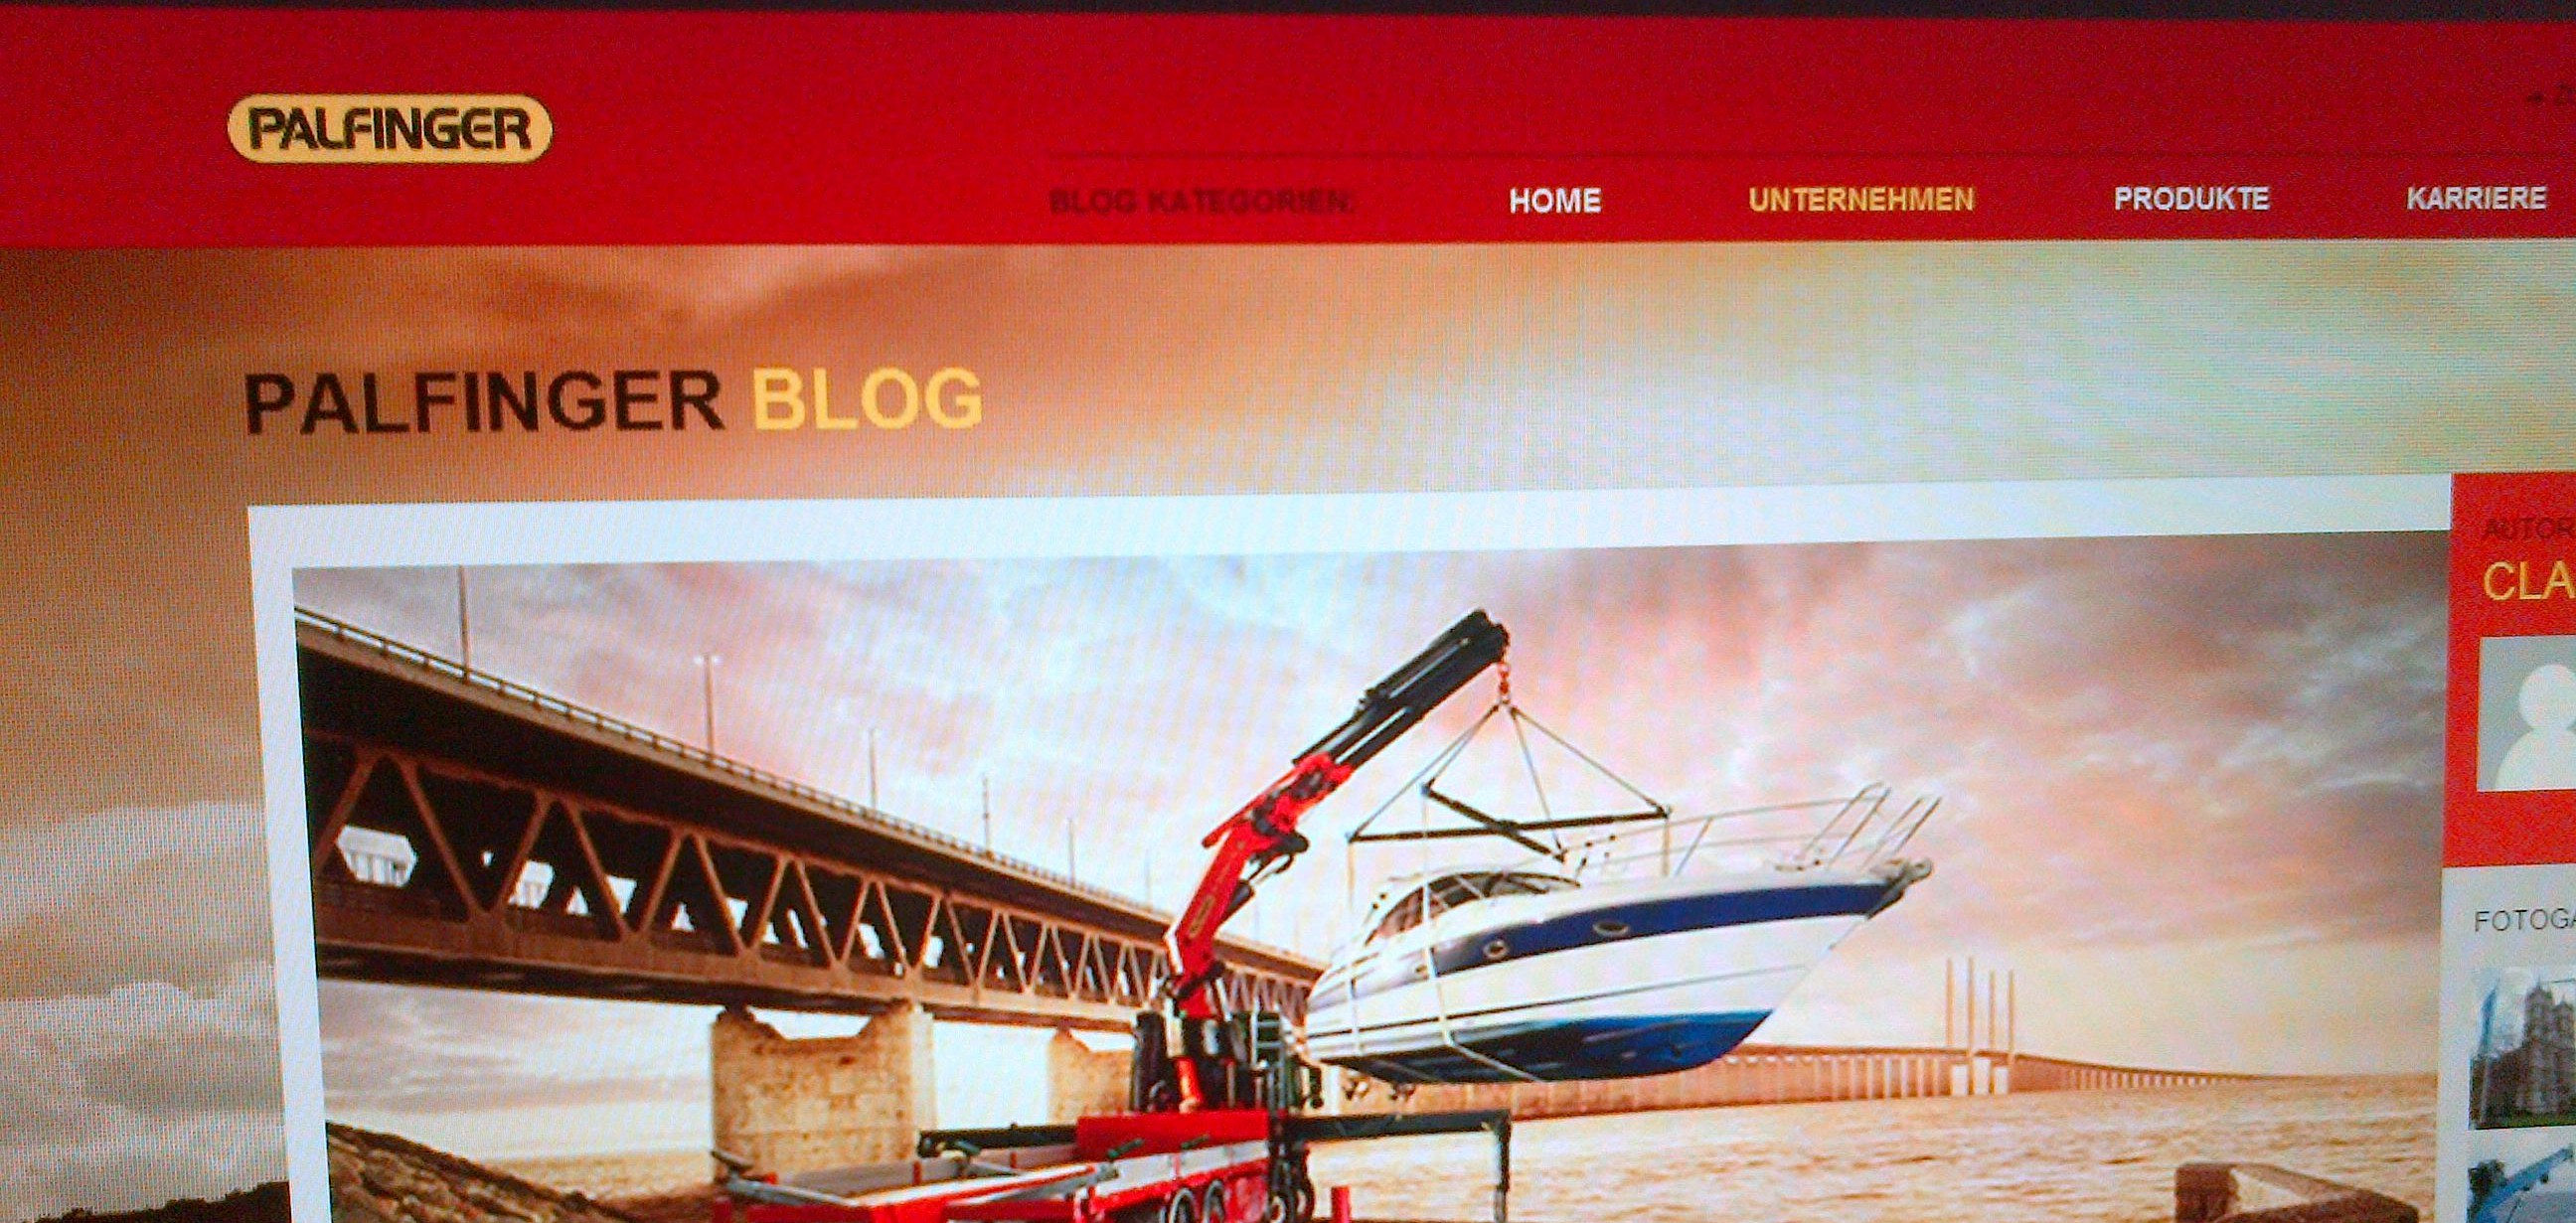 PALFINGER Blog